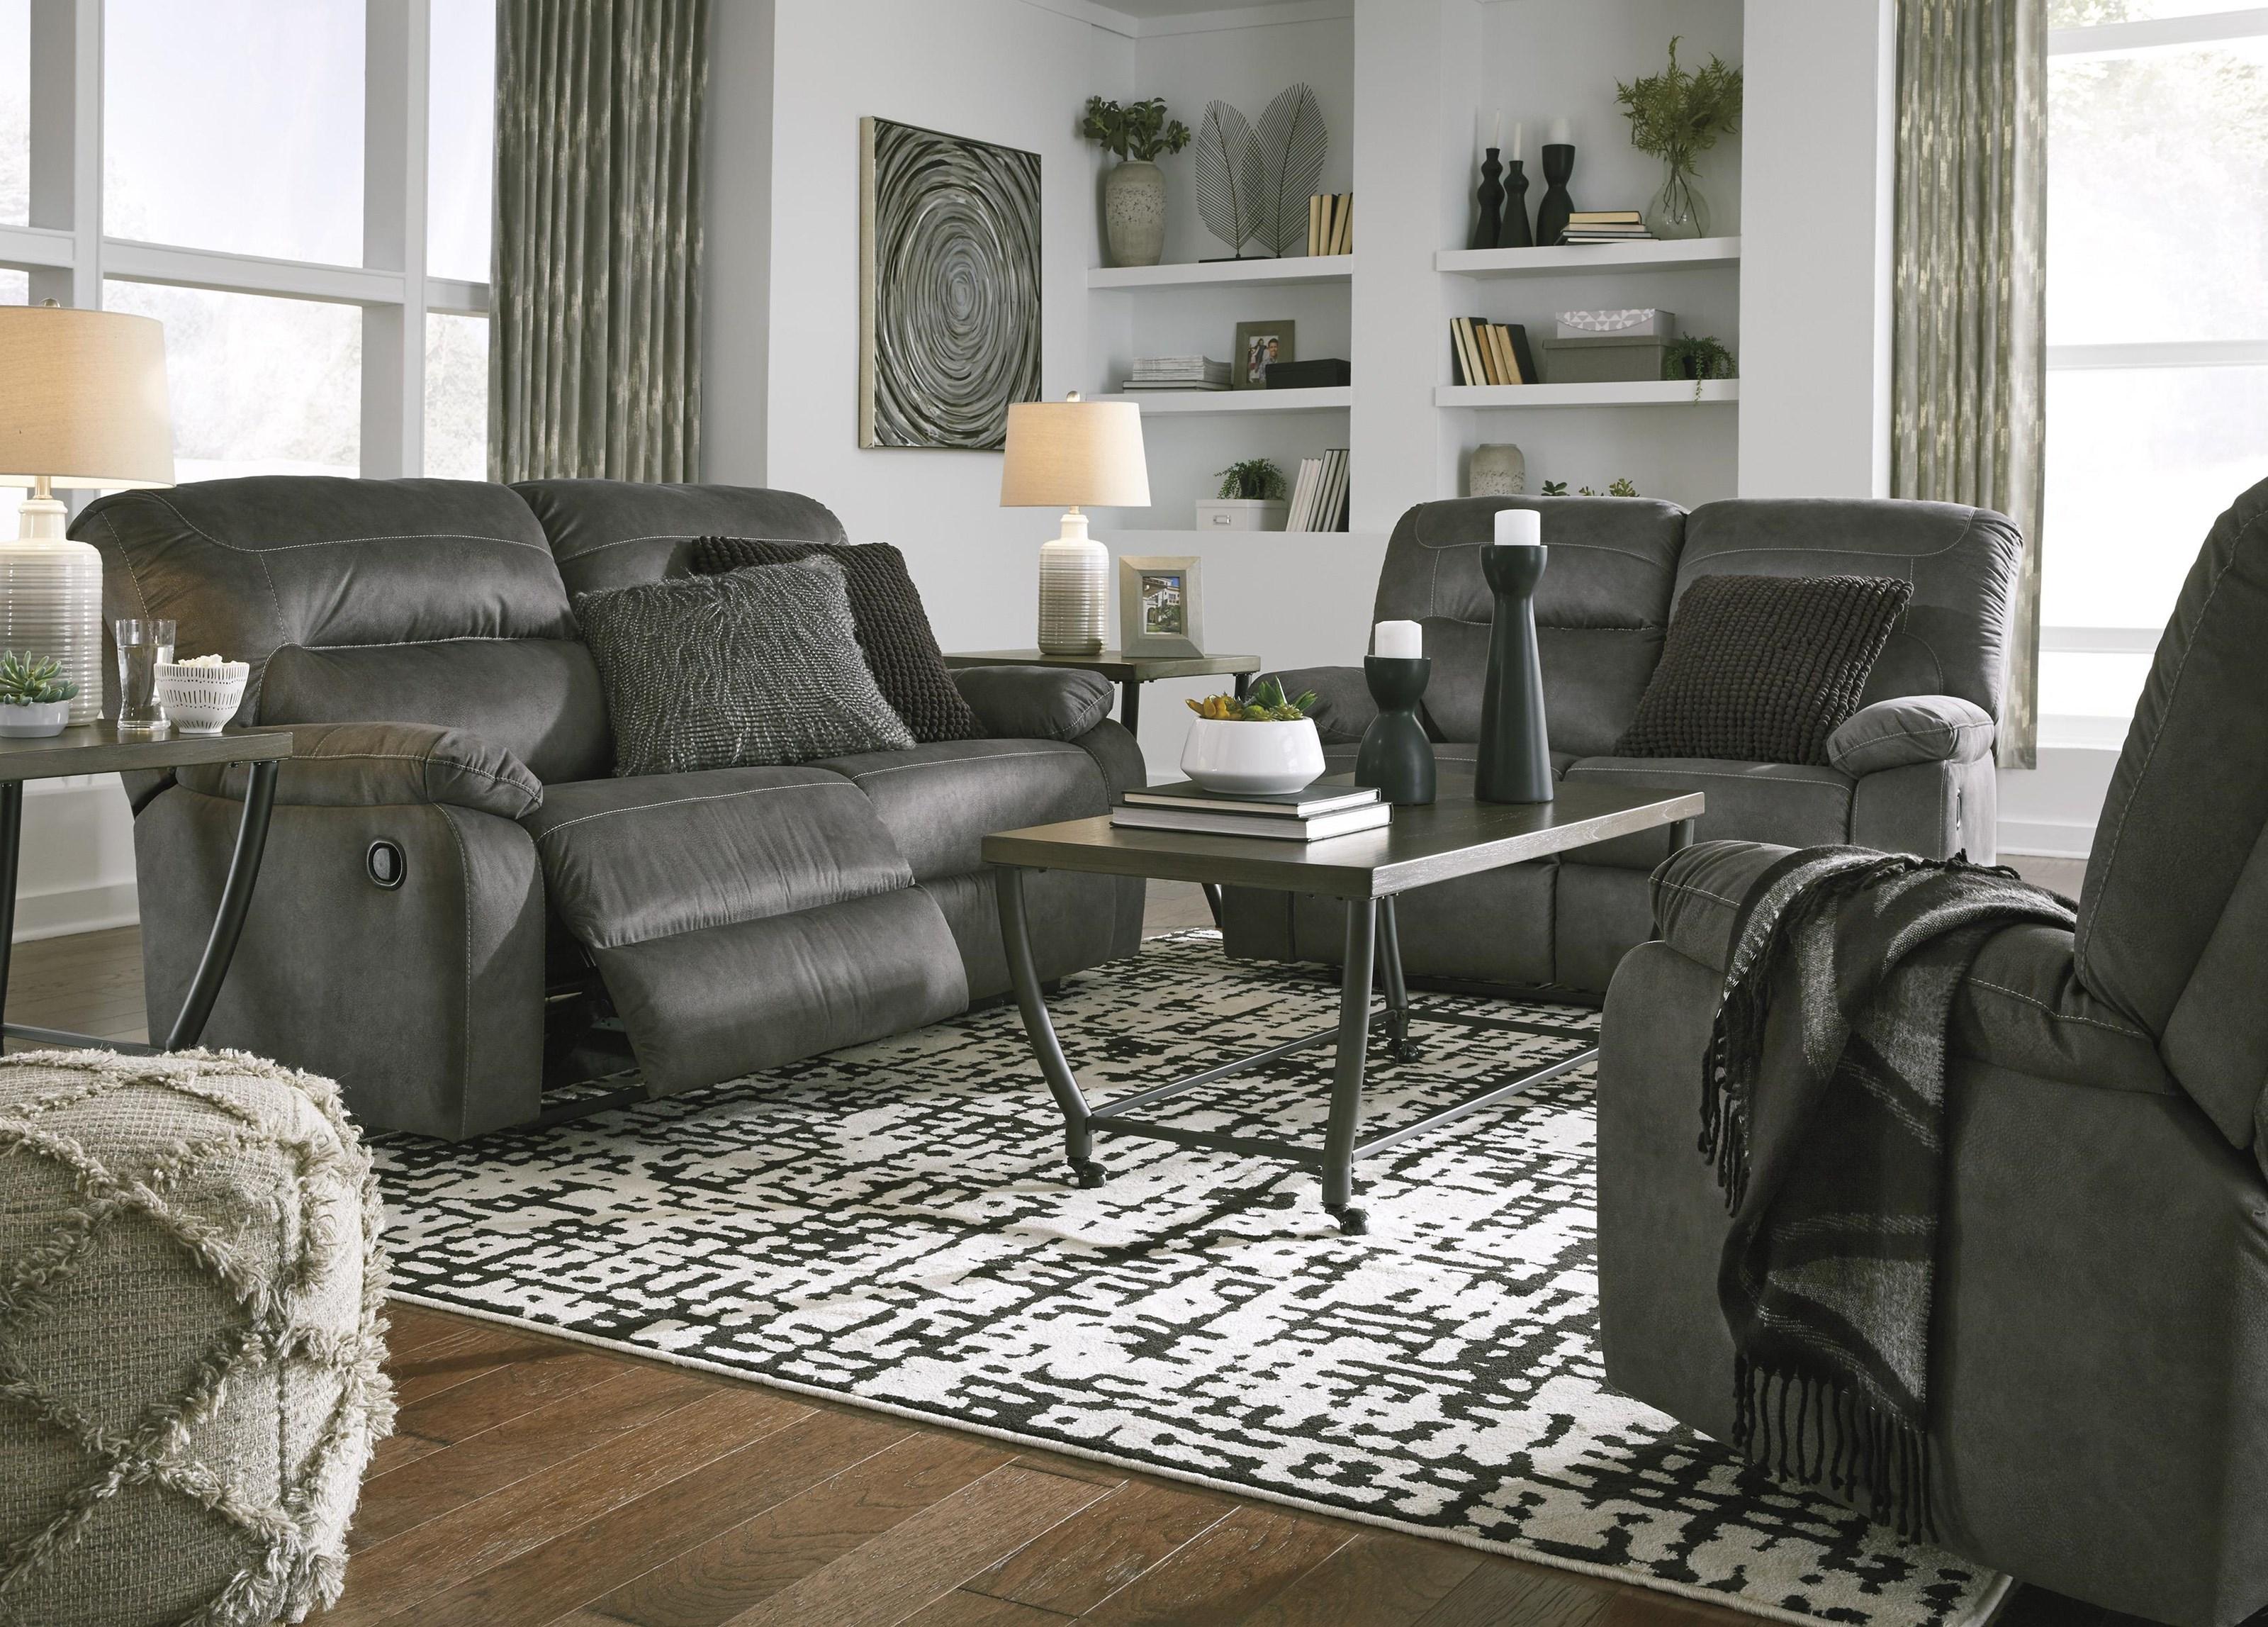 Bolzano Recliner Sofa and Recliner Set by Benchcraft at Sam Levitz Furniture